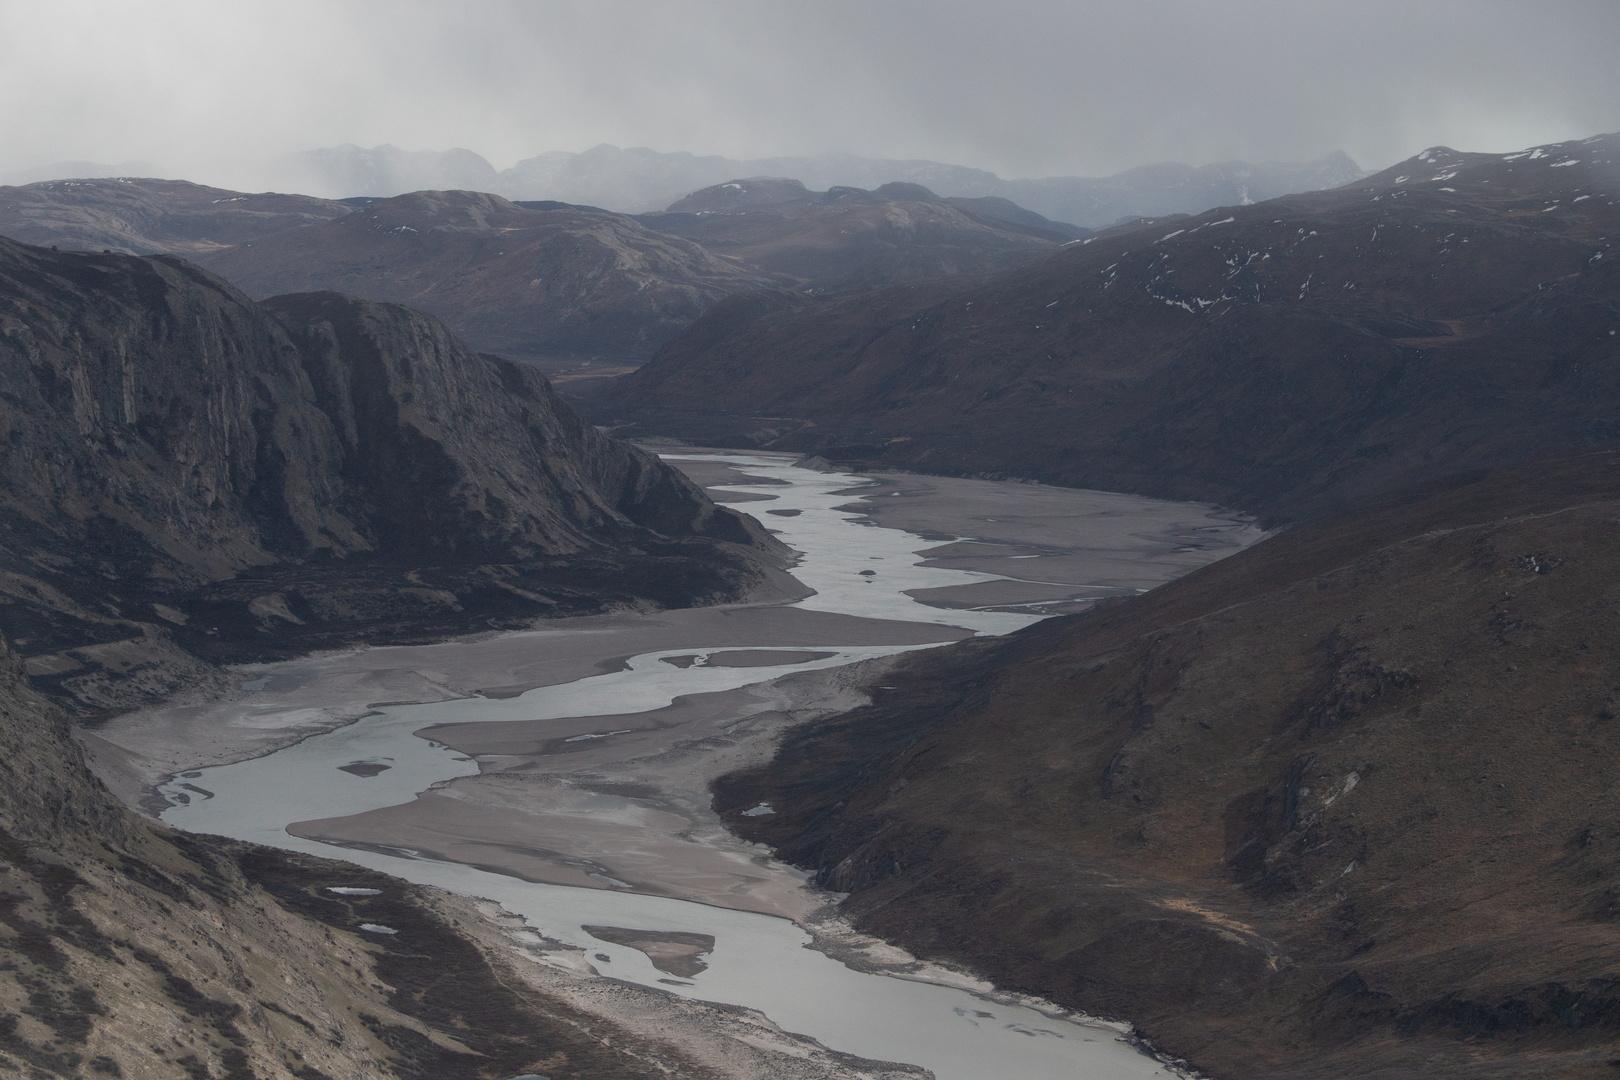 بلينكن يطمئن غرينلاند: لا نعتزم شراء جزيرتكم